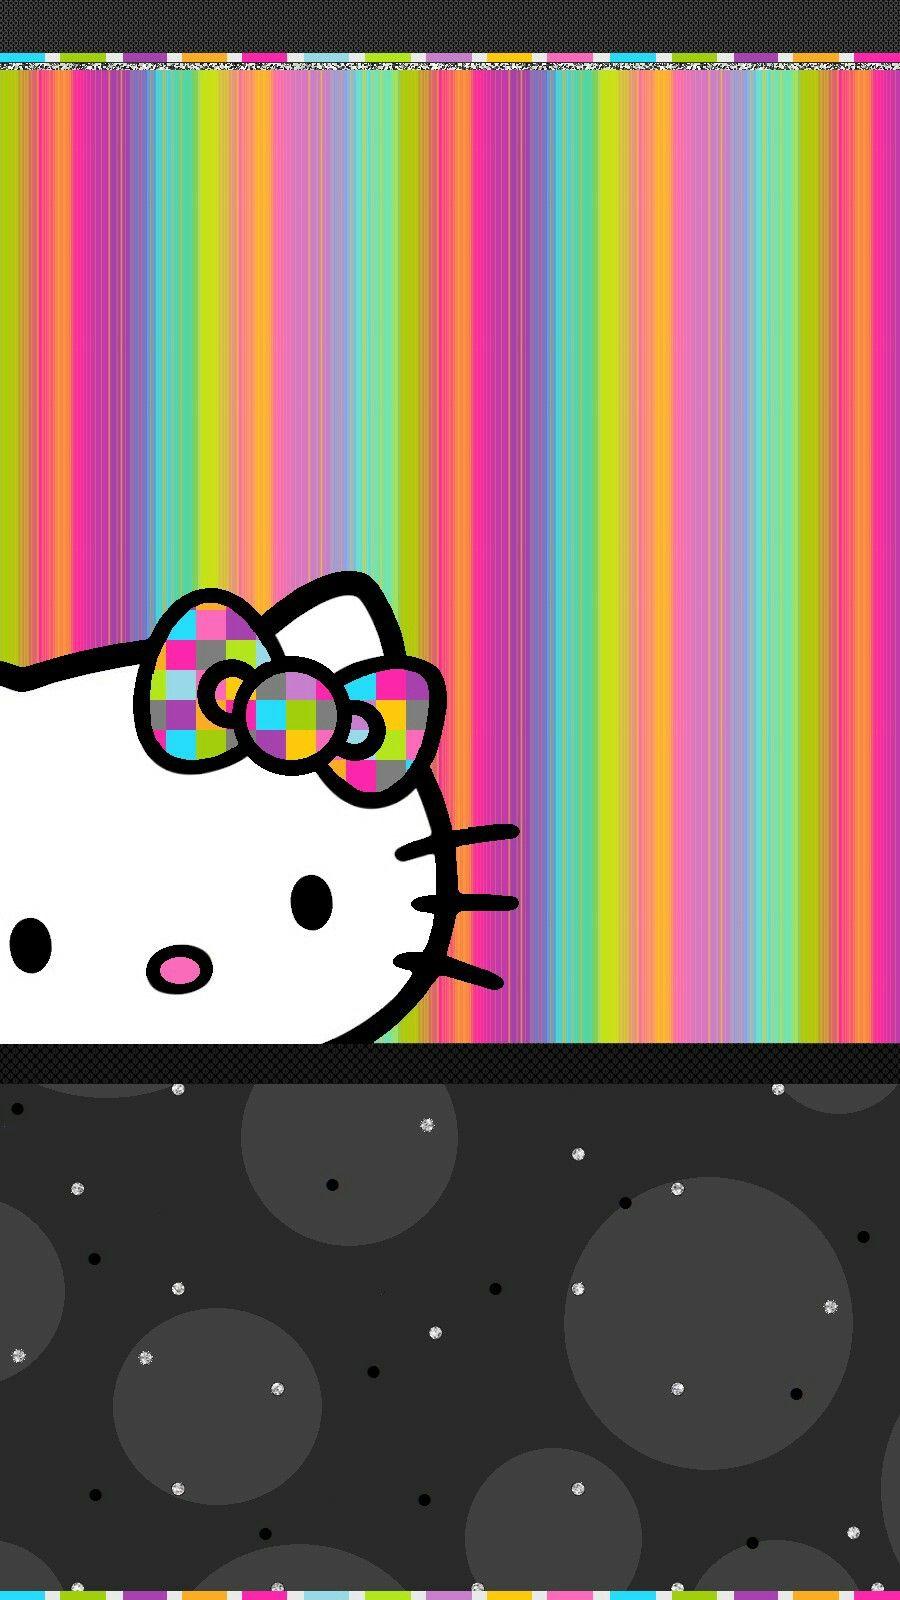 Most Inspiring Wallpaper Hello Kitty Ipod Touch - 9c5b6b4376b3dccf2746335cc61aa458  Photograph_854158.jpg